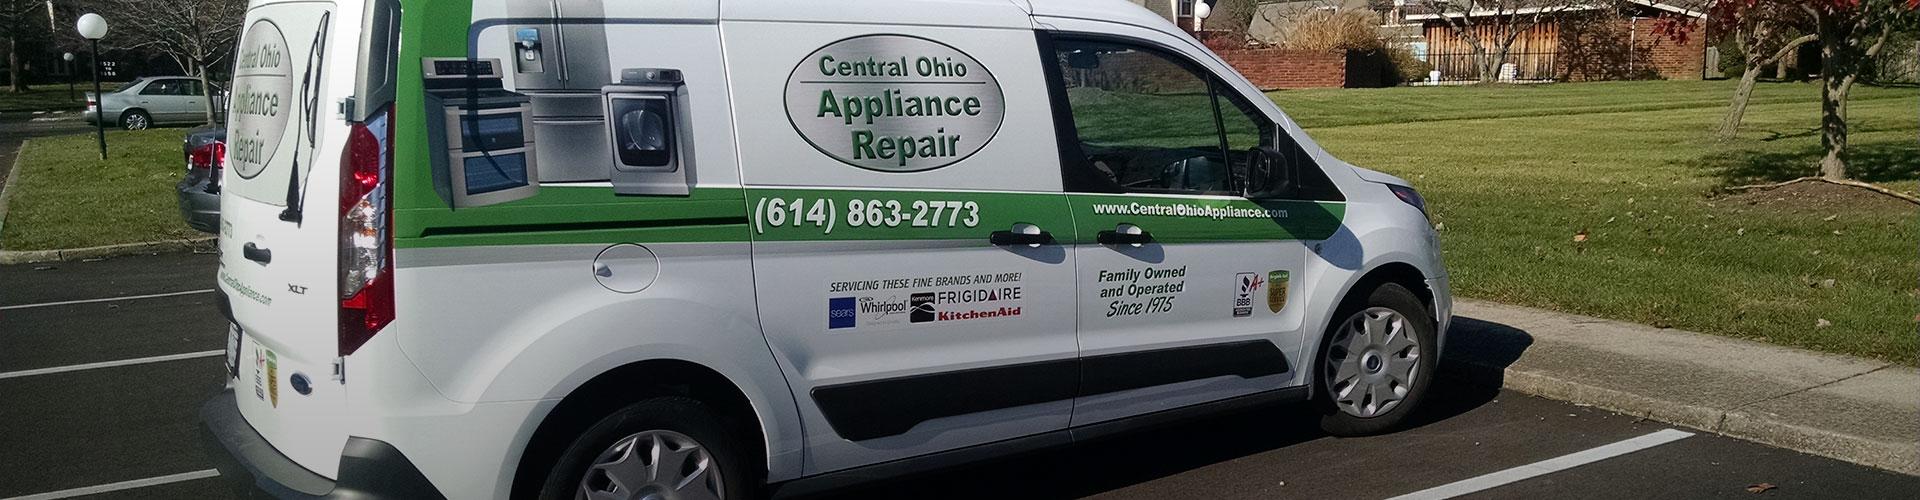 Kitchenaid Contact Us